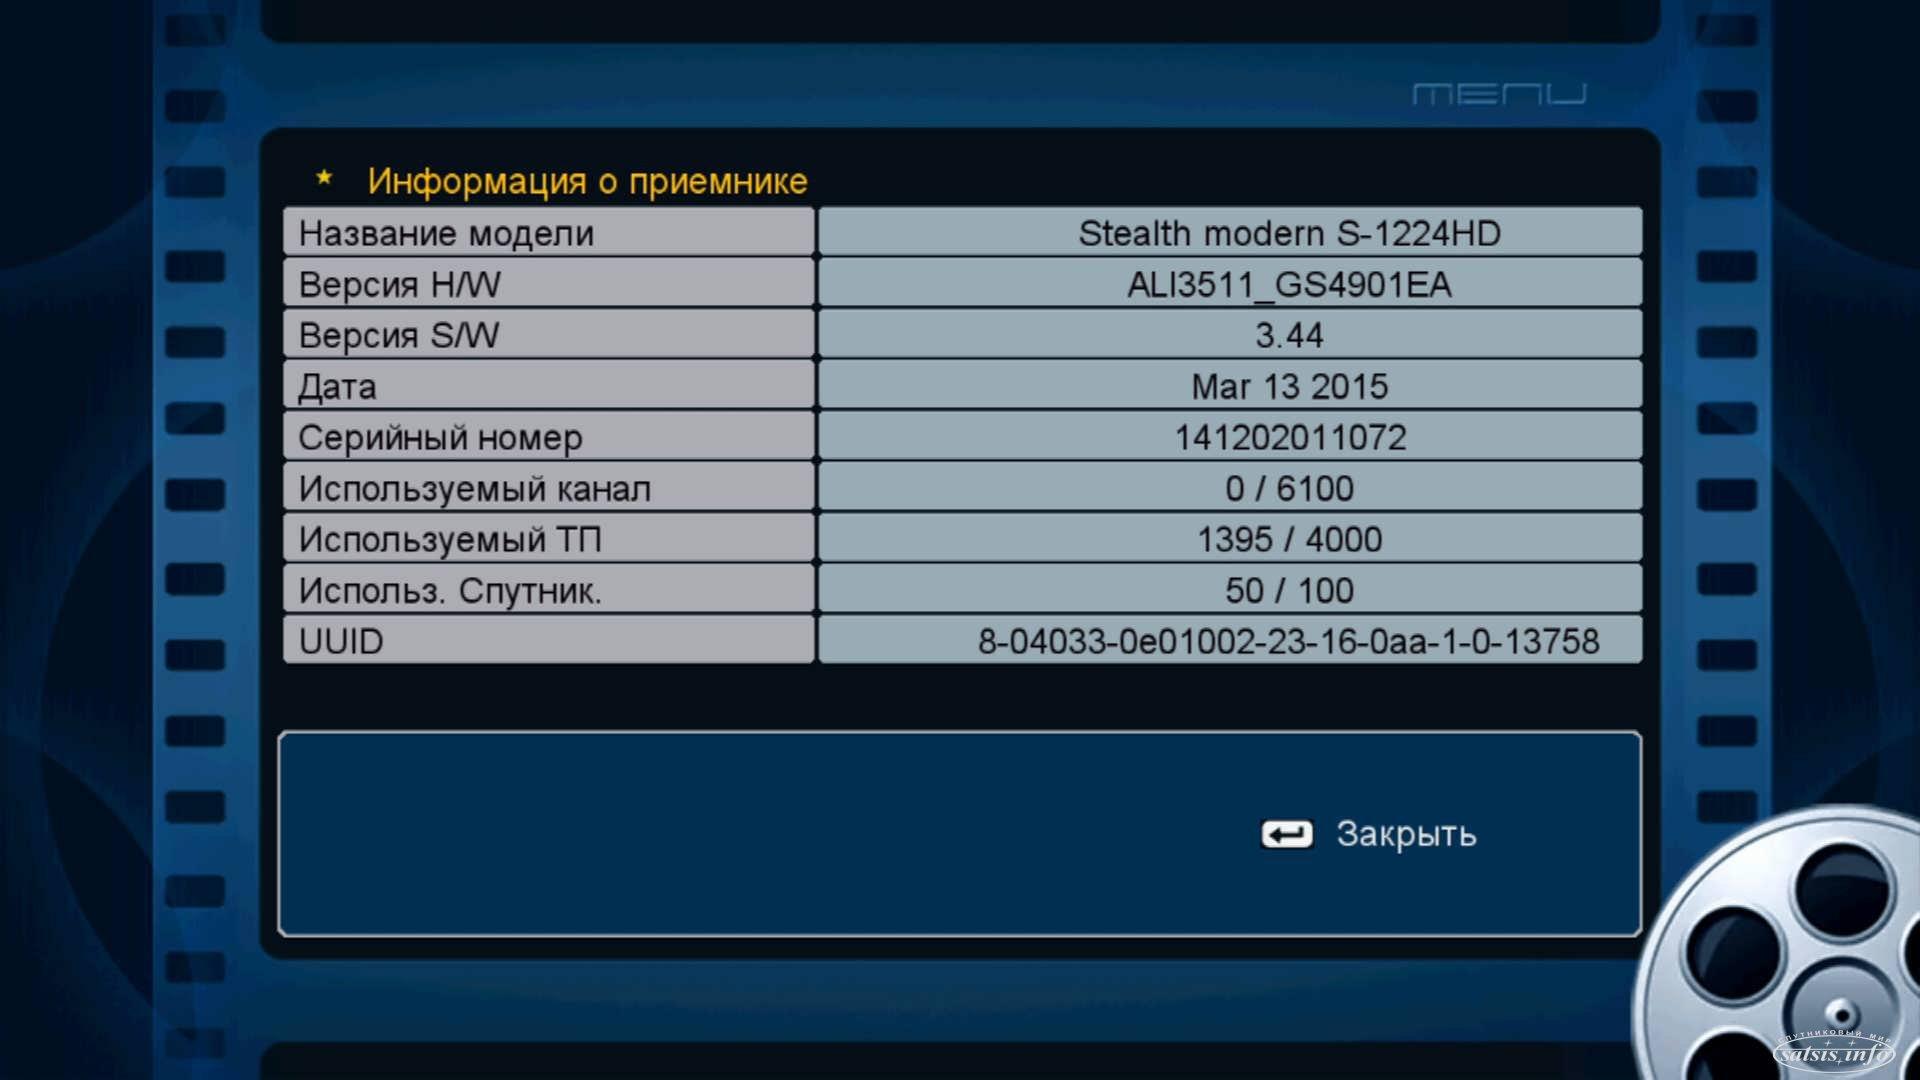 https://satsis.info/uploads/posts/2015-04/1429910440_www.satsis.info__sat-integral-s-1224-hd-stealth-modern_5.jpg